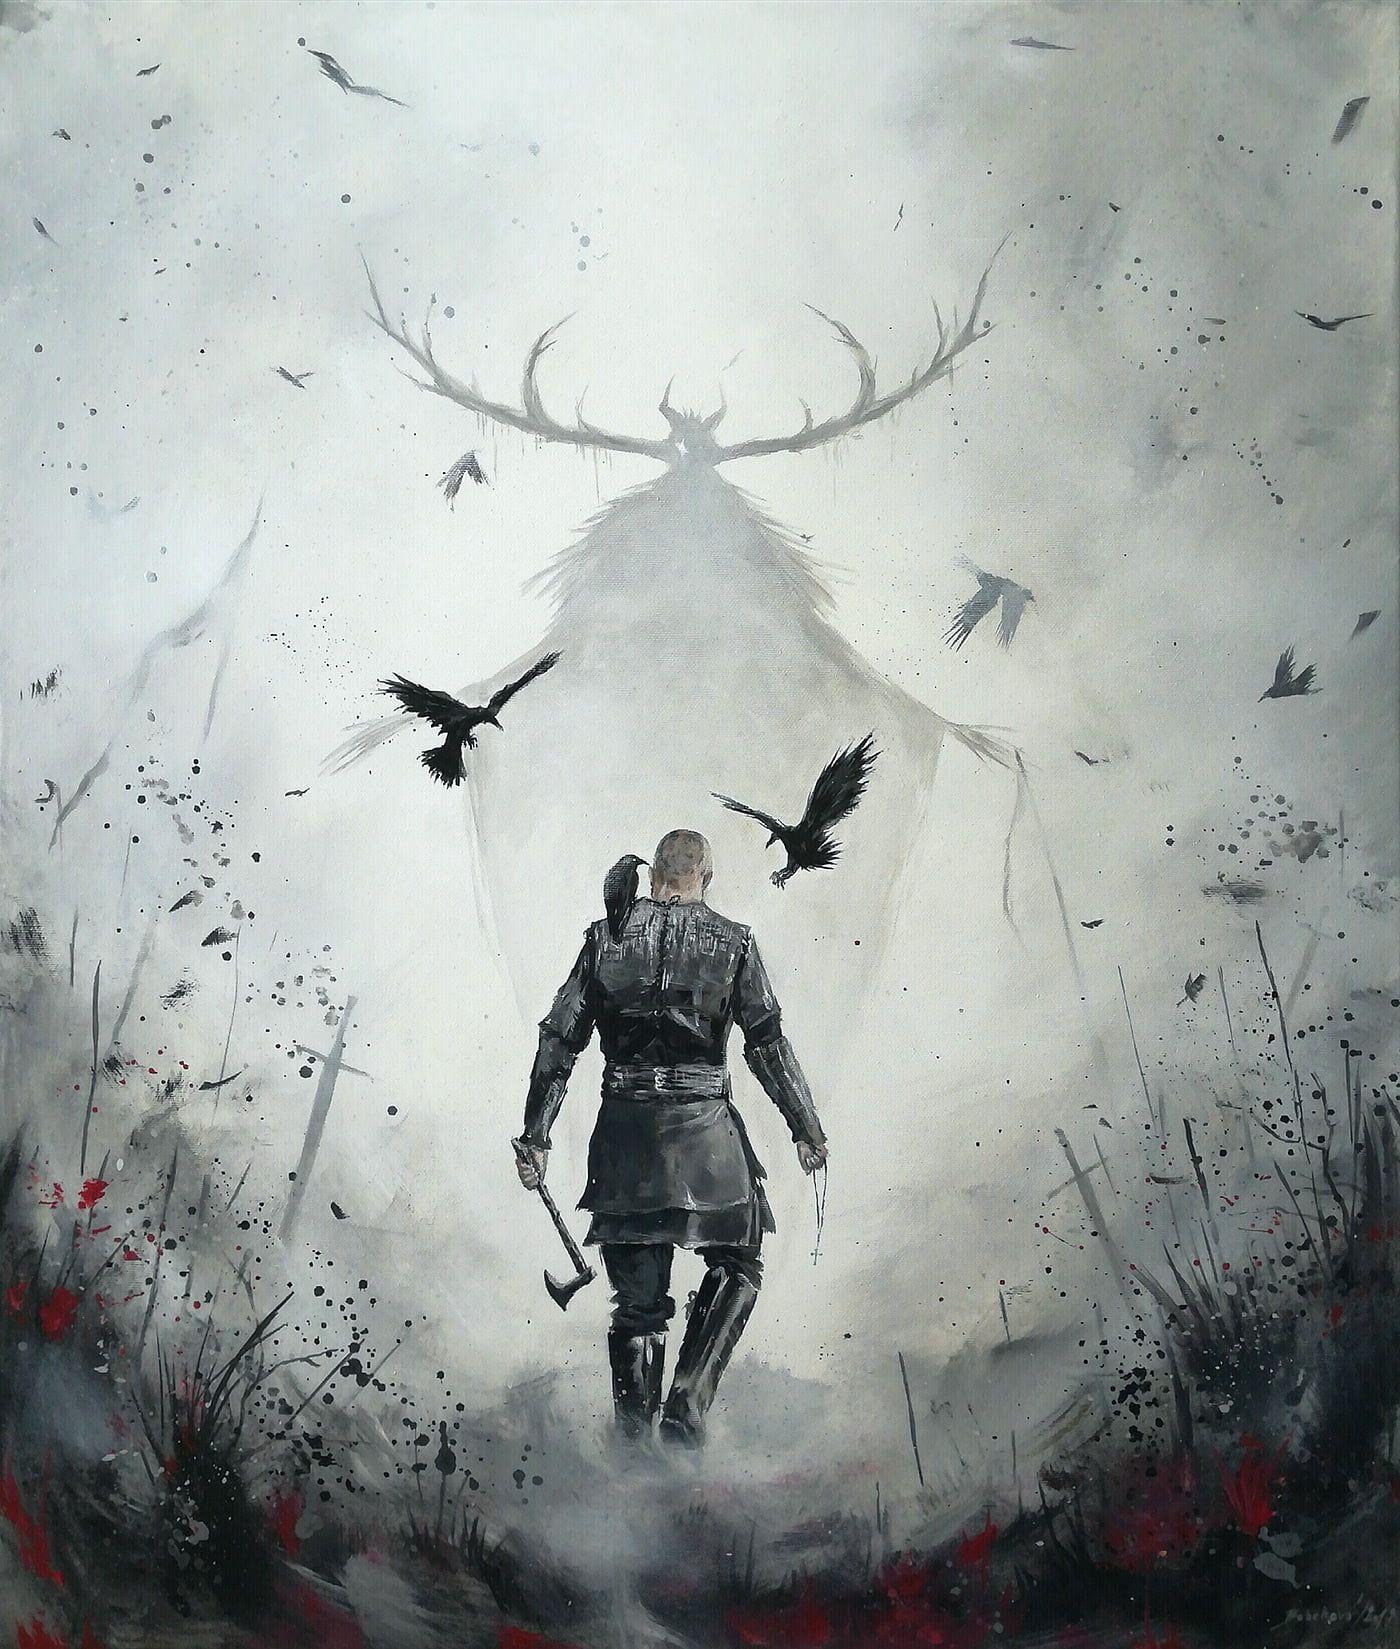 Norse Vikings Wallpaper 4k - osakayuku.com